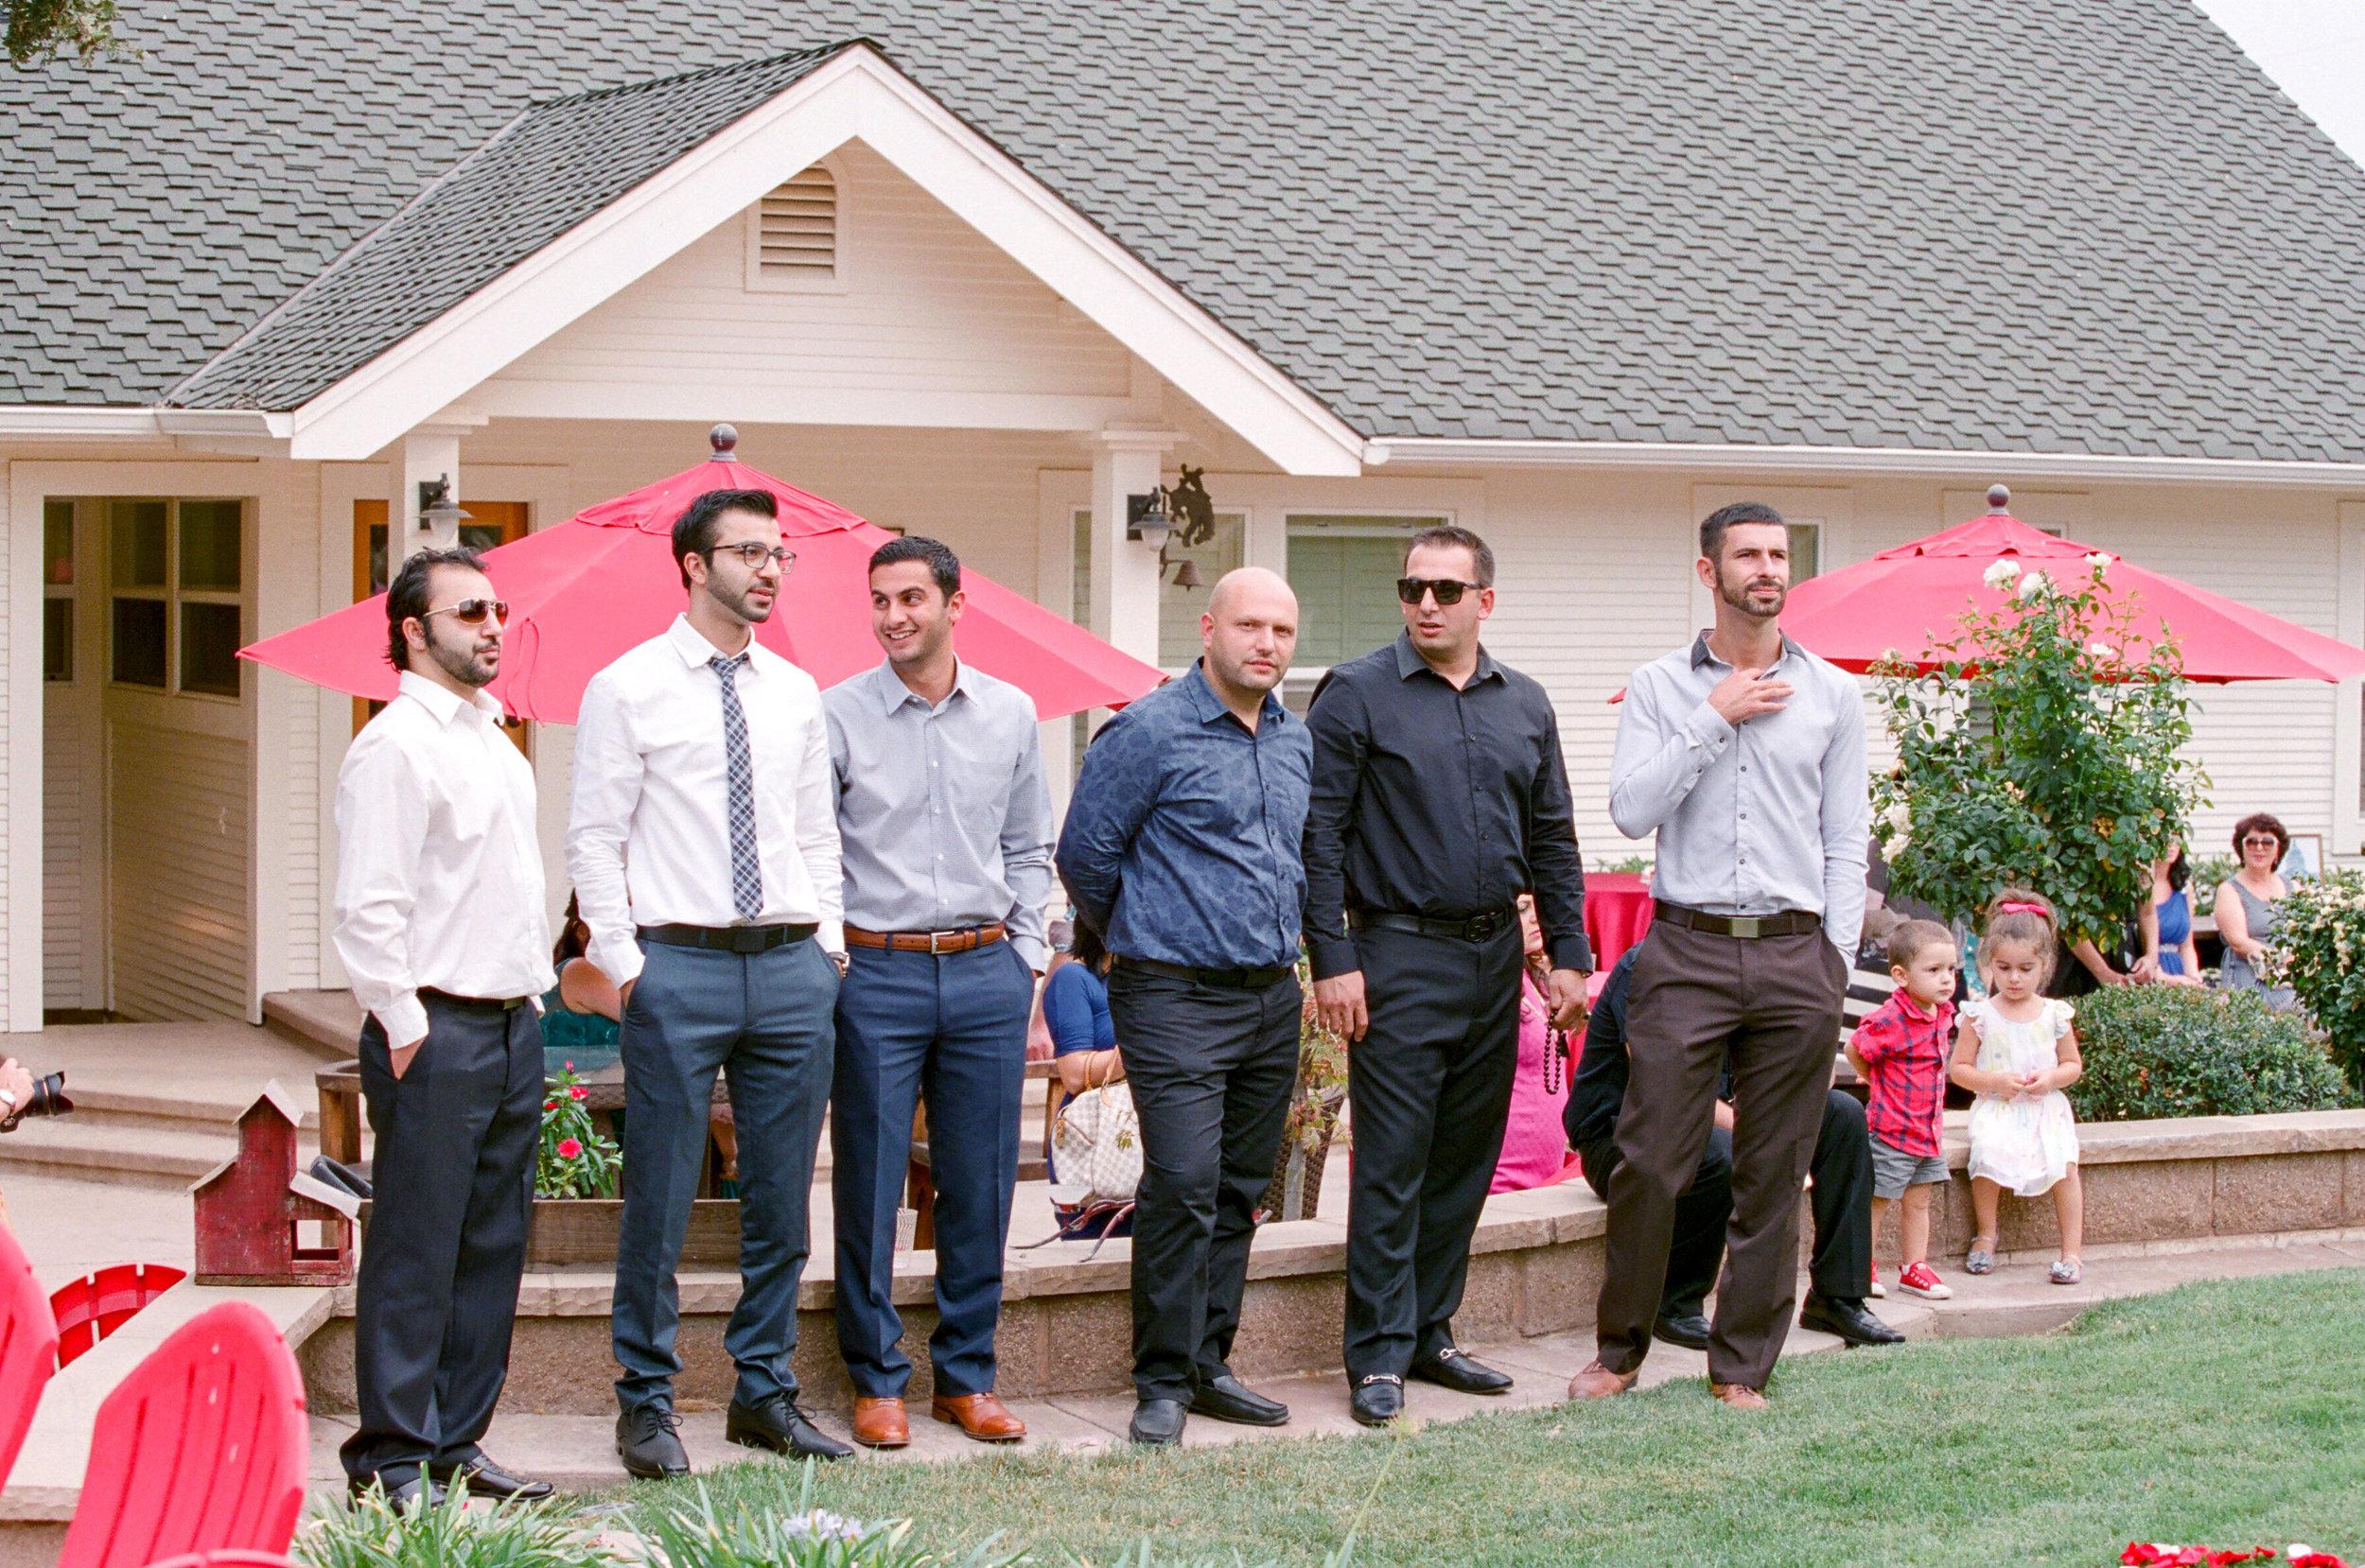 Amador_County_Wedding_Guests_Rancho_Victoria_Vineyard_Northern_California.jpg